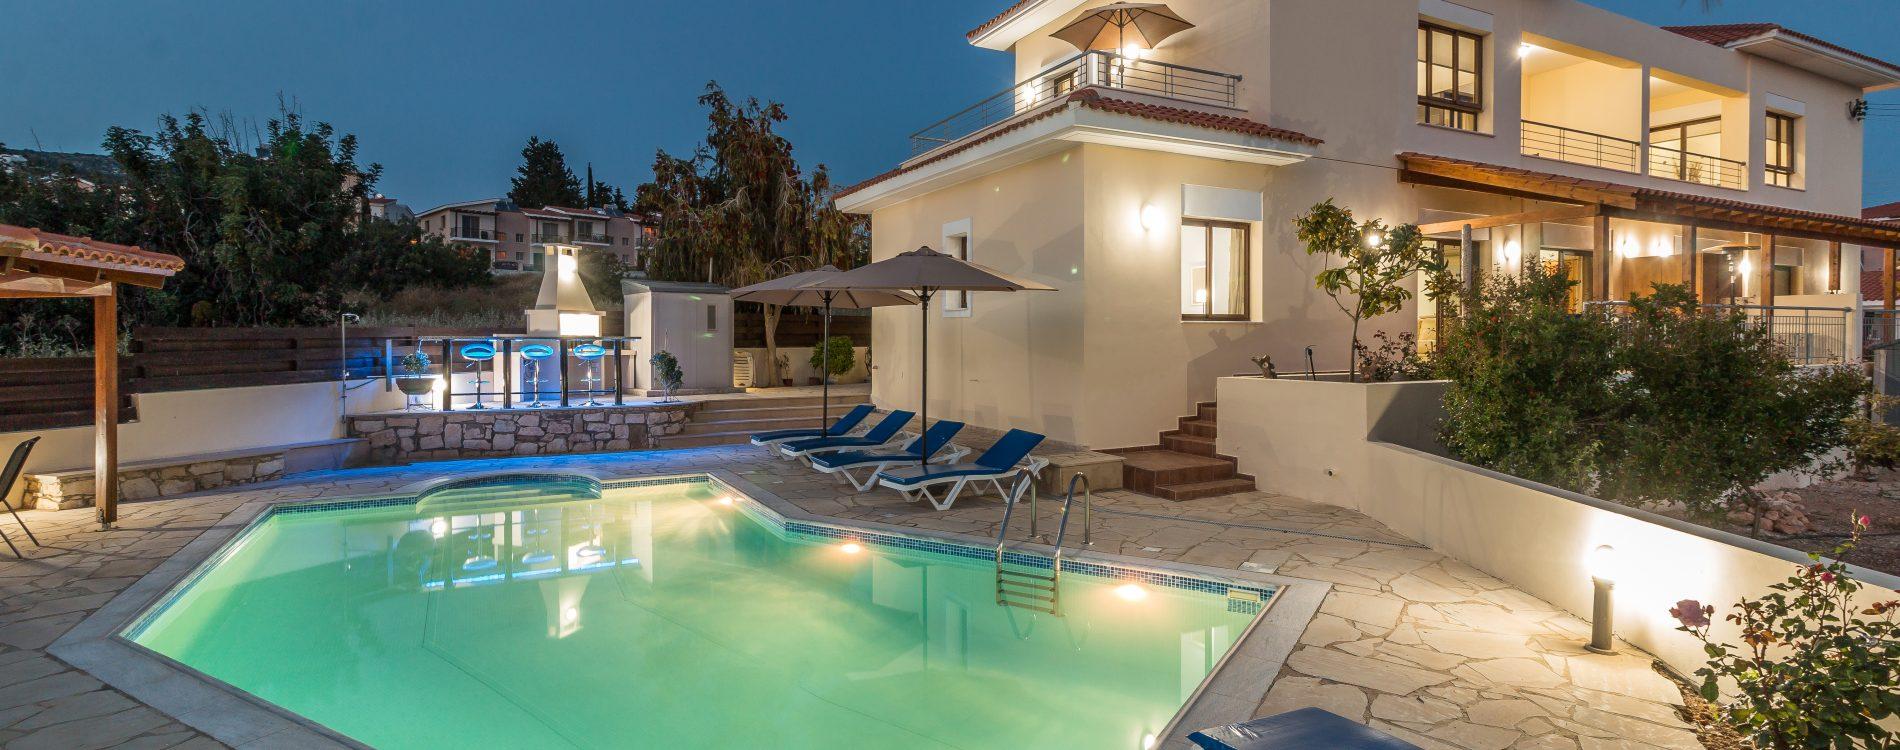 Arbnb villa at Peyia